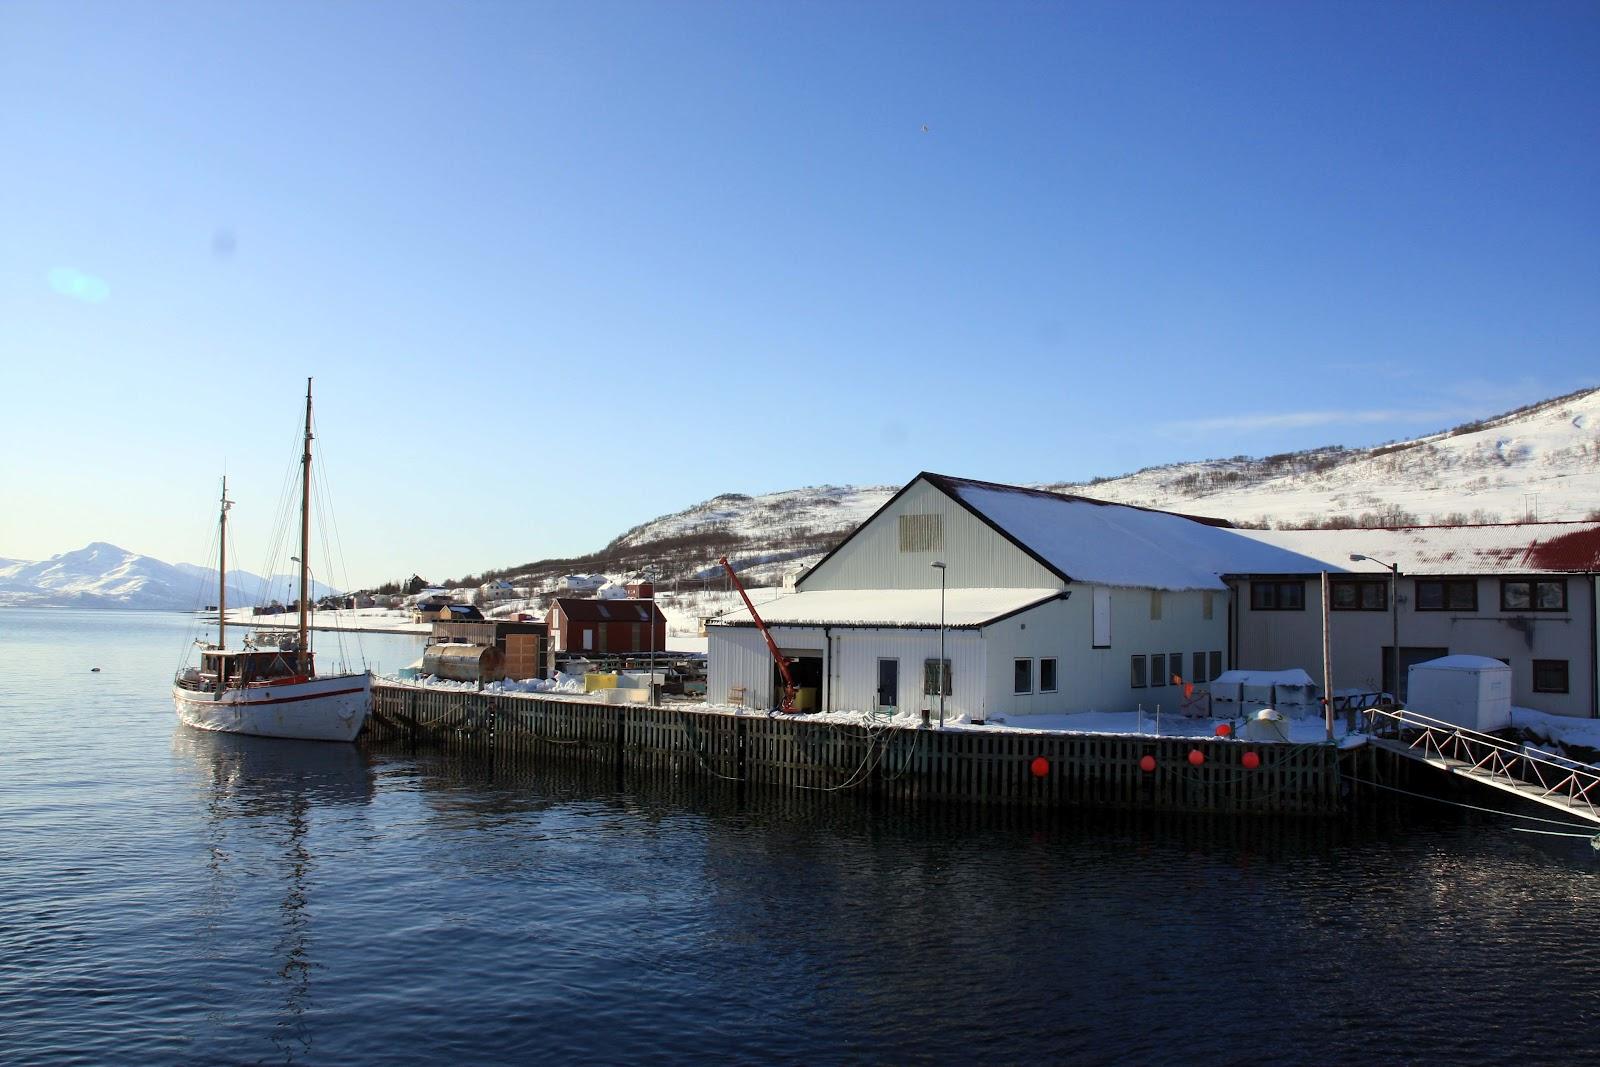 Noleggio Barche Akkarvik - Navalia | Noleggia un Sogno